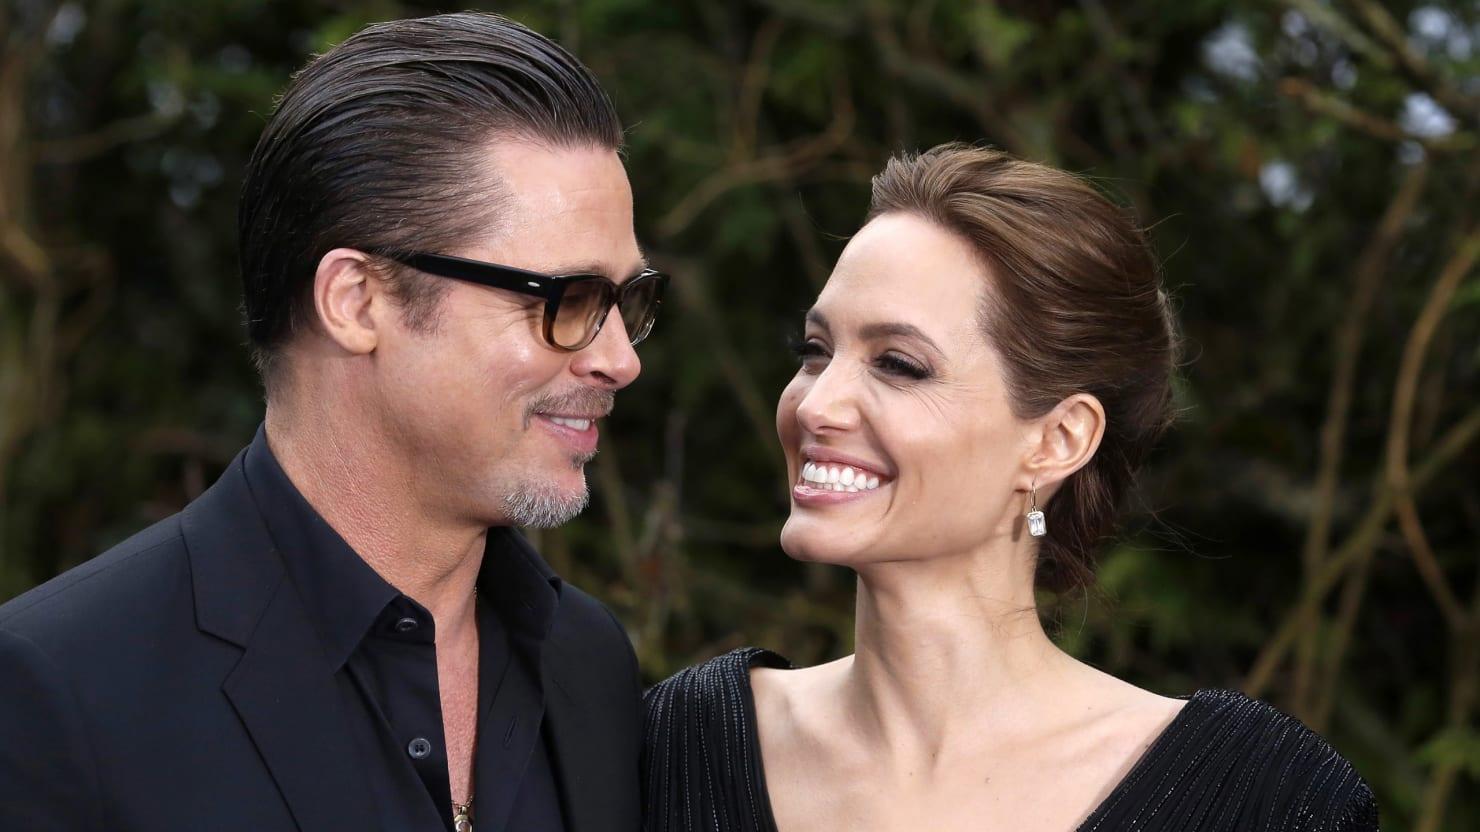 No Happy Endings: Angelina Jolie Files for Divorce from BradPitt forecast